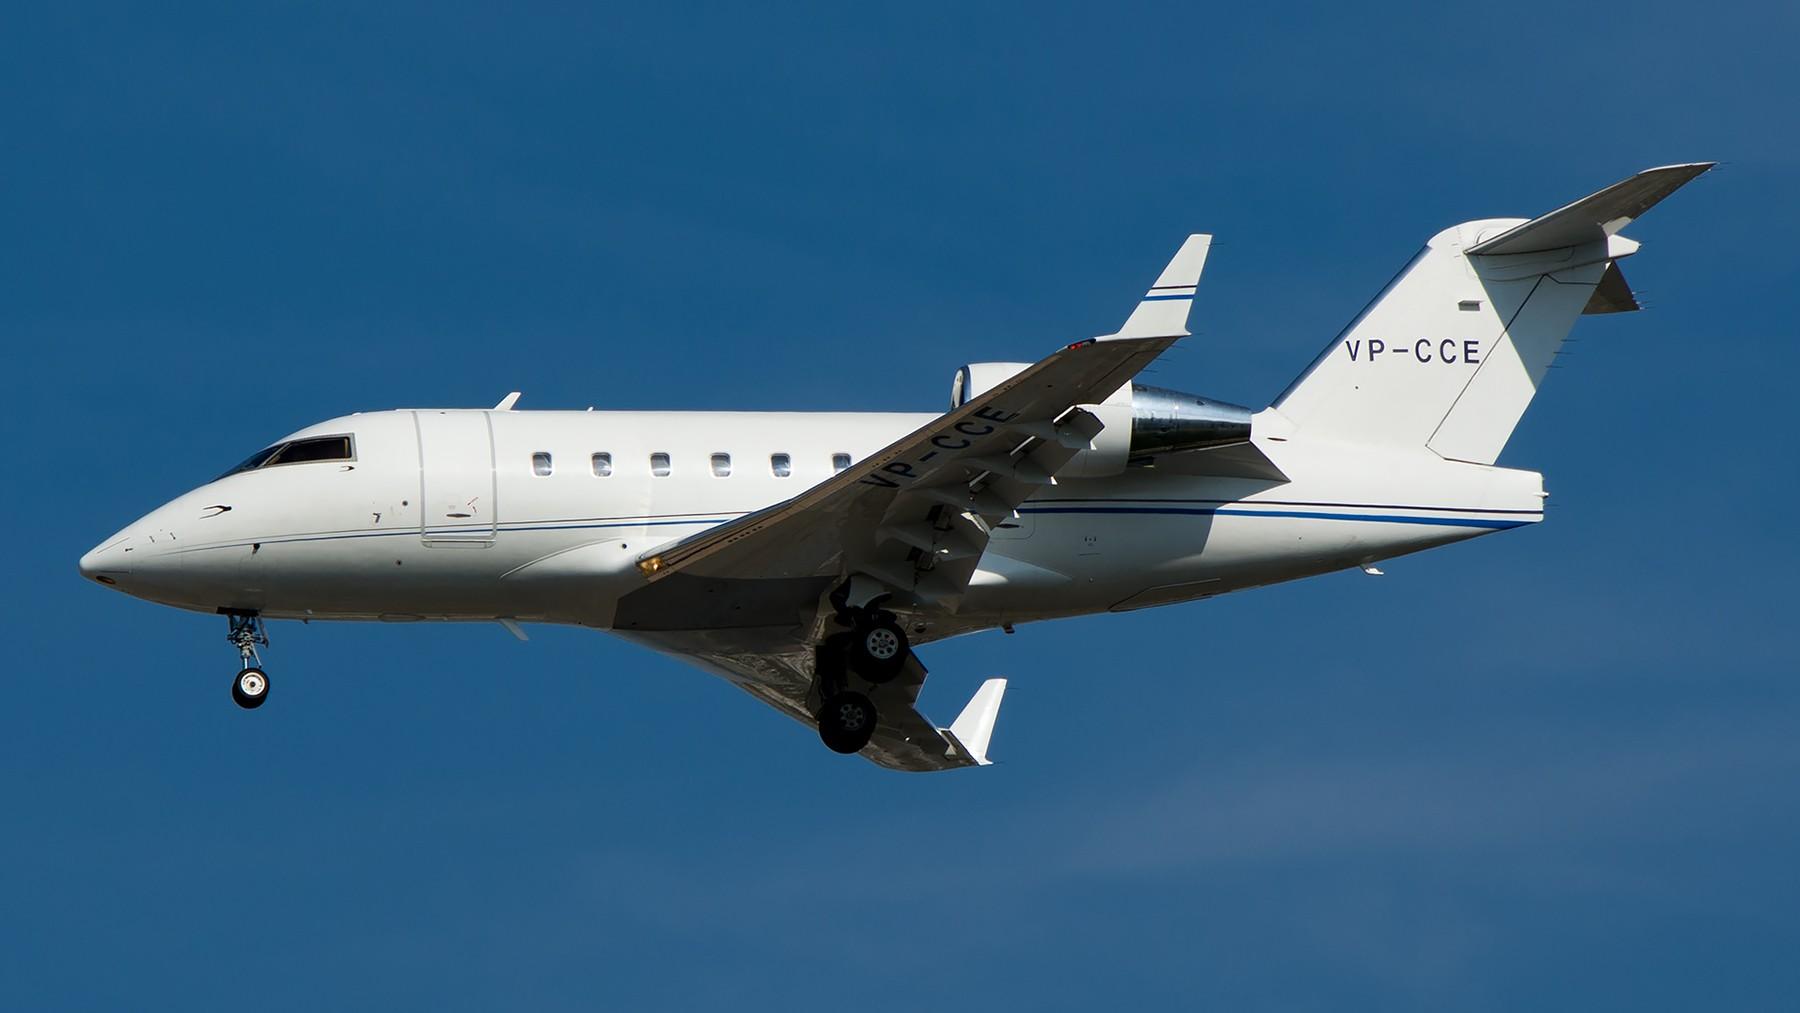 Re:[原创]终于放假了,出来冒个泡,随便发几张 BOMBARDIER CL-600 VP-CCE 中国北京首都国际机场